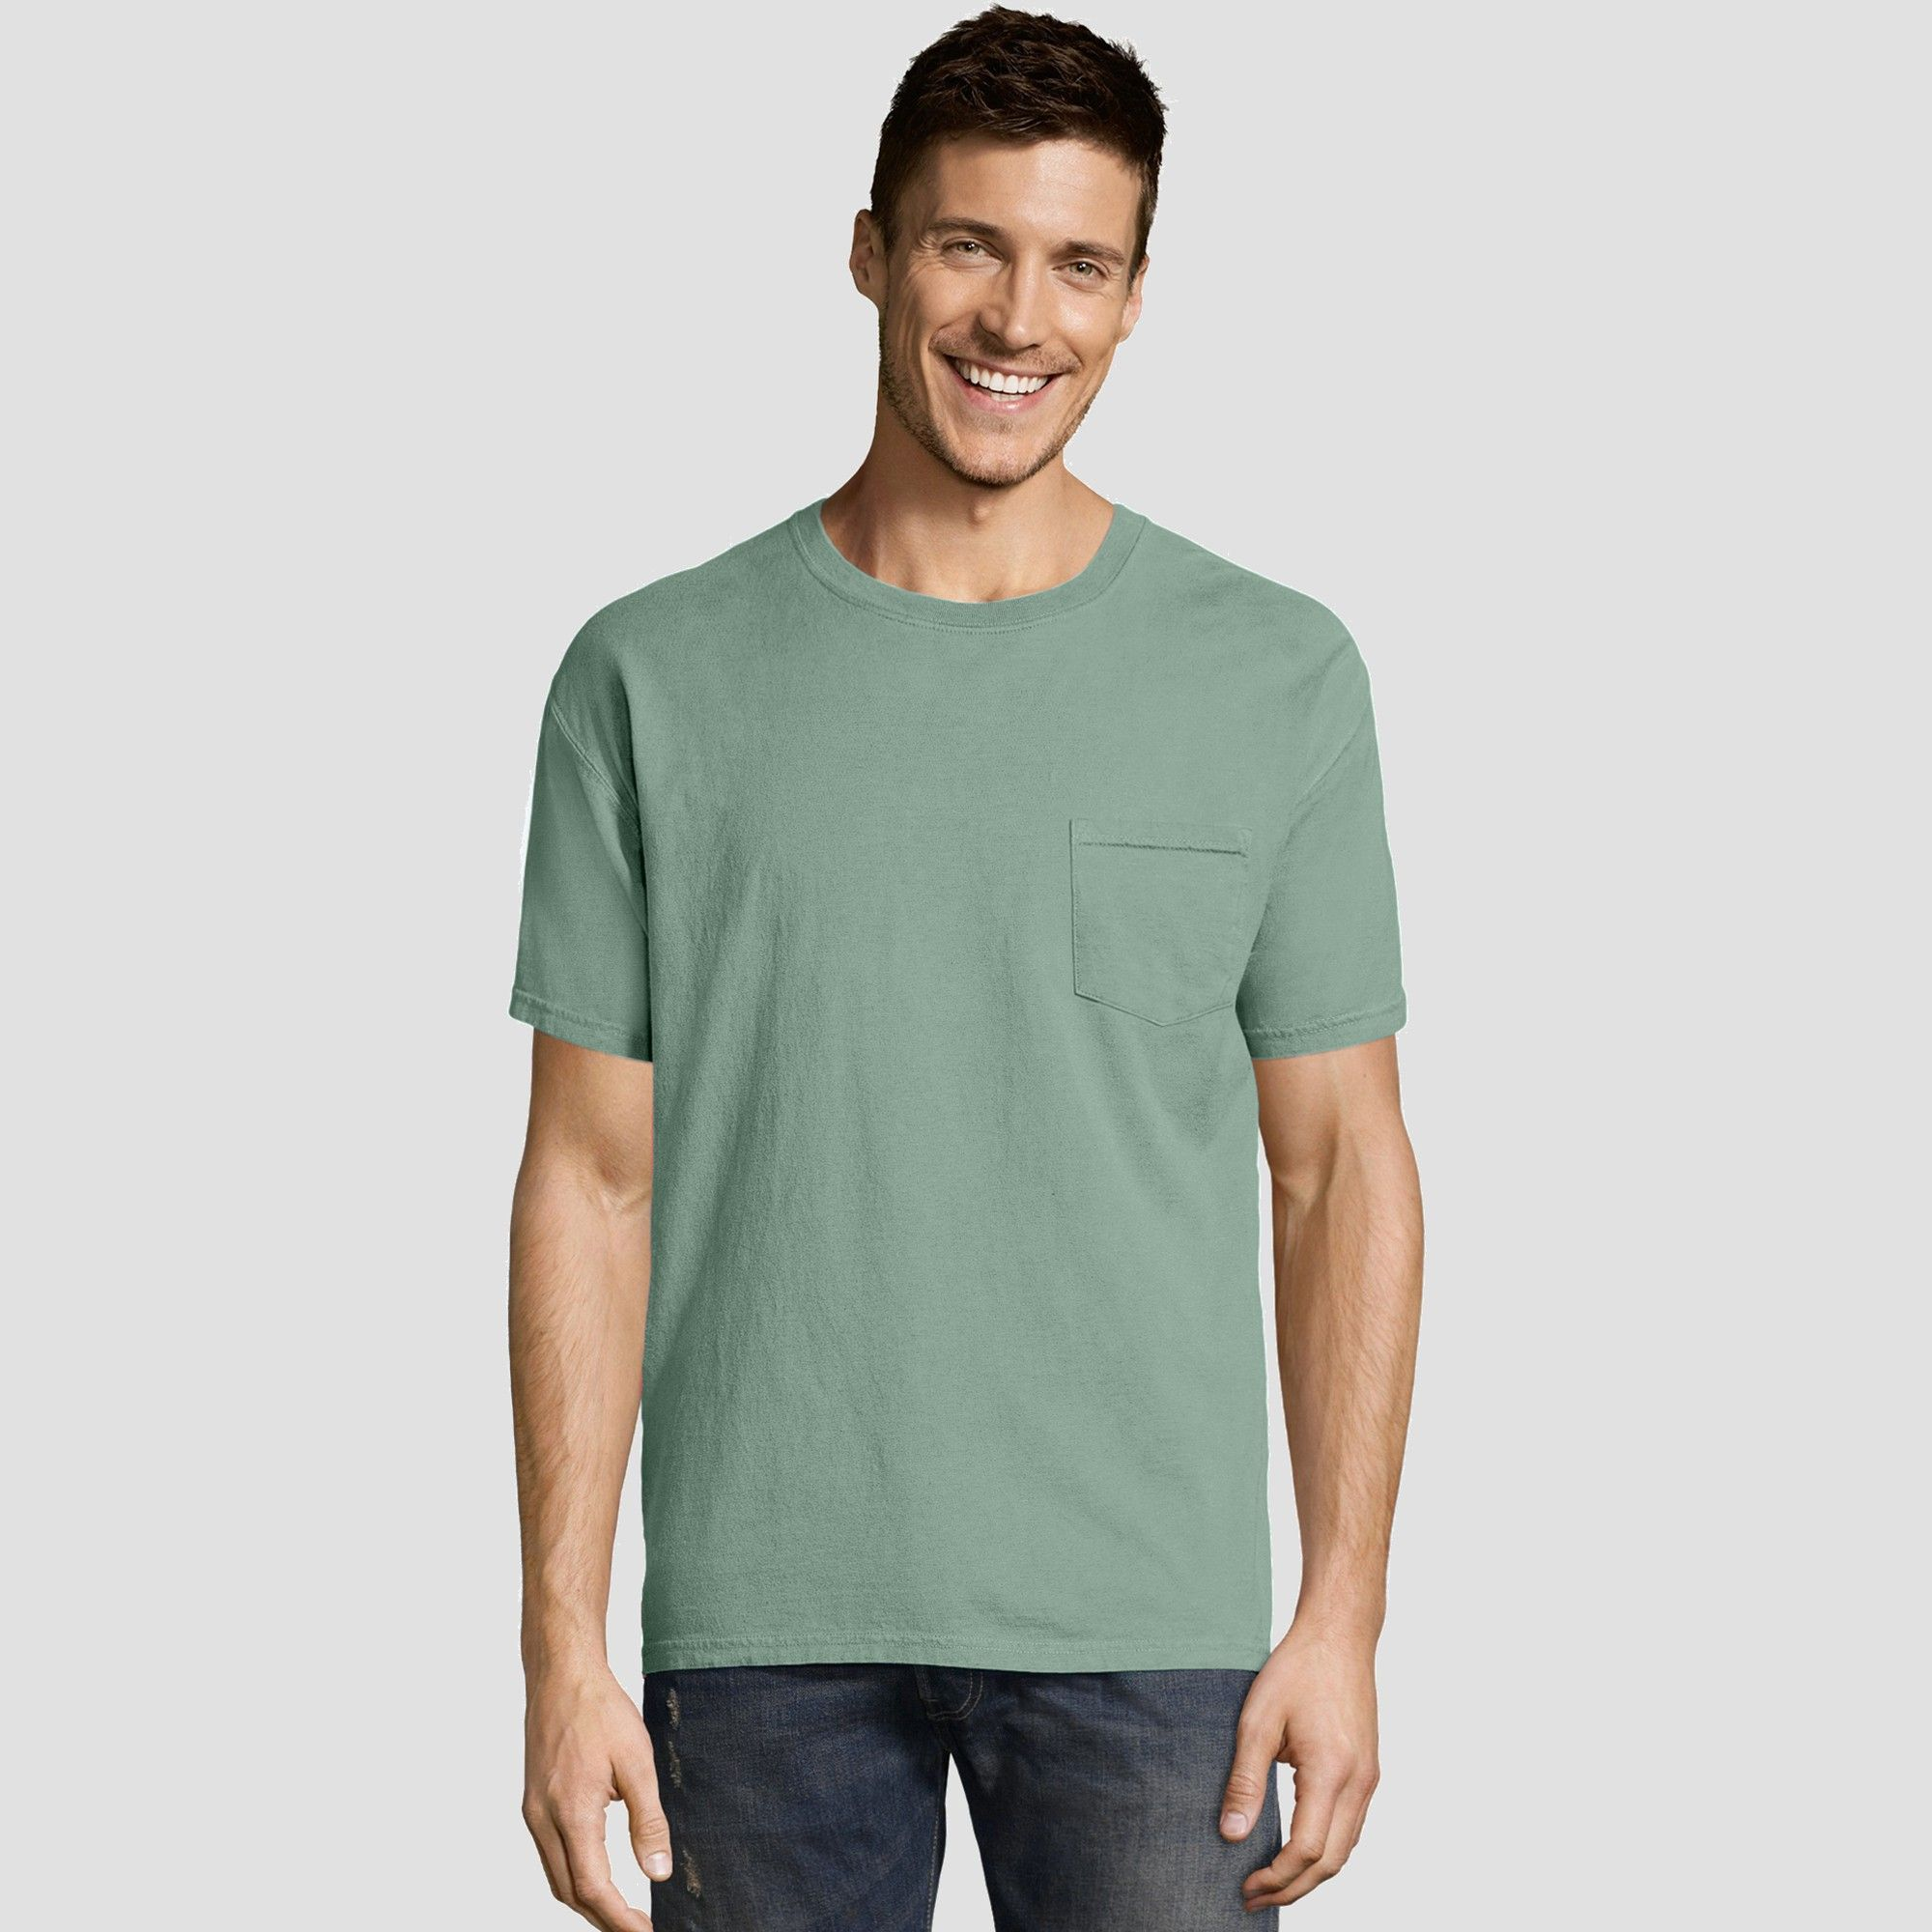 bcb7aa9ca0c Hanes Men s Short Sleeve 1901 Garment Dyed Pocket T-Shirt - Cypress ...